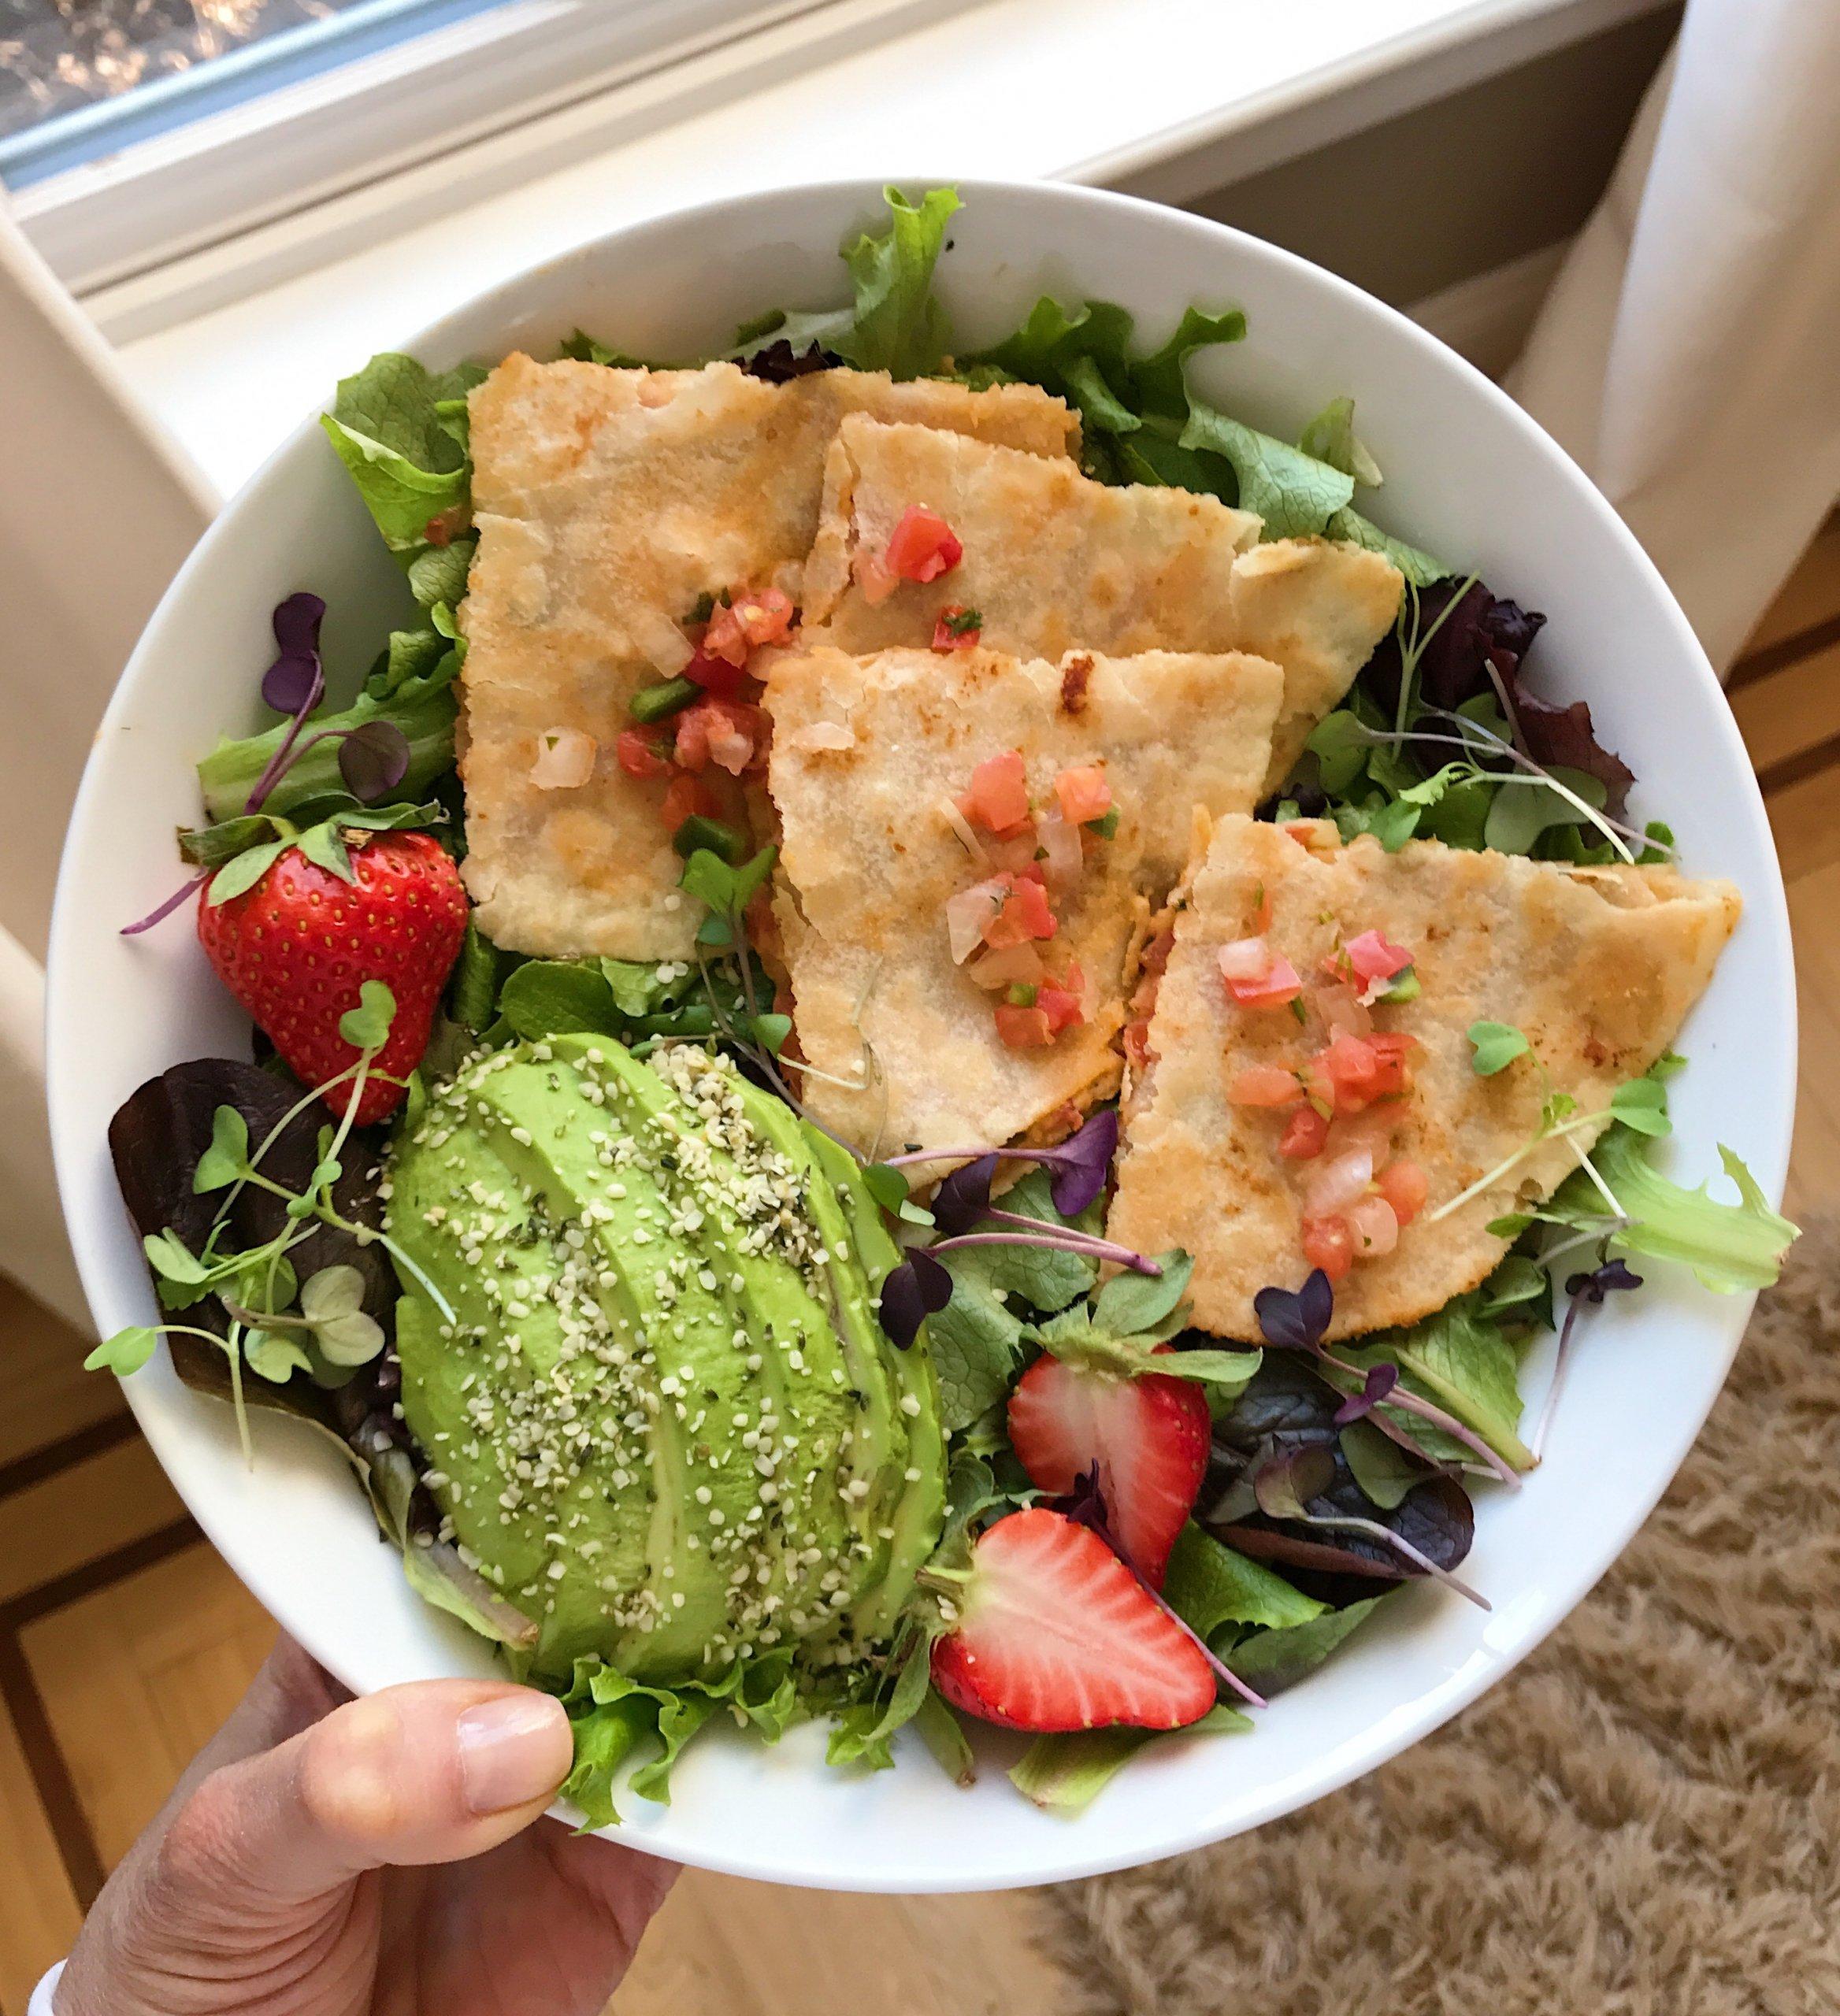 Red Pepper Hummus Salsa quesadilla gluten-free #glutenfree www.healthygffamily.com